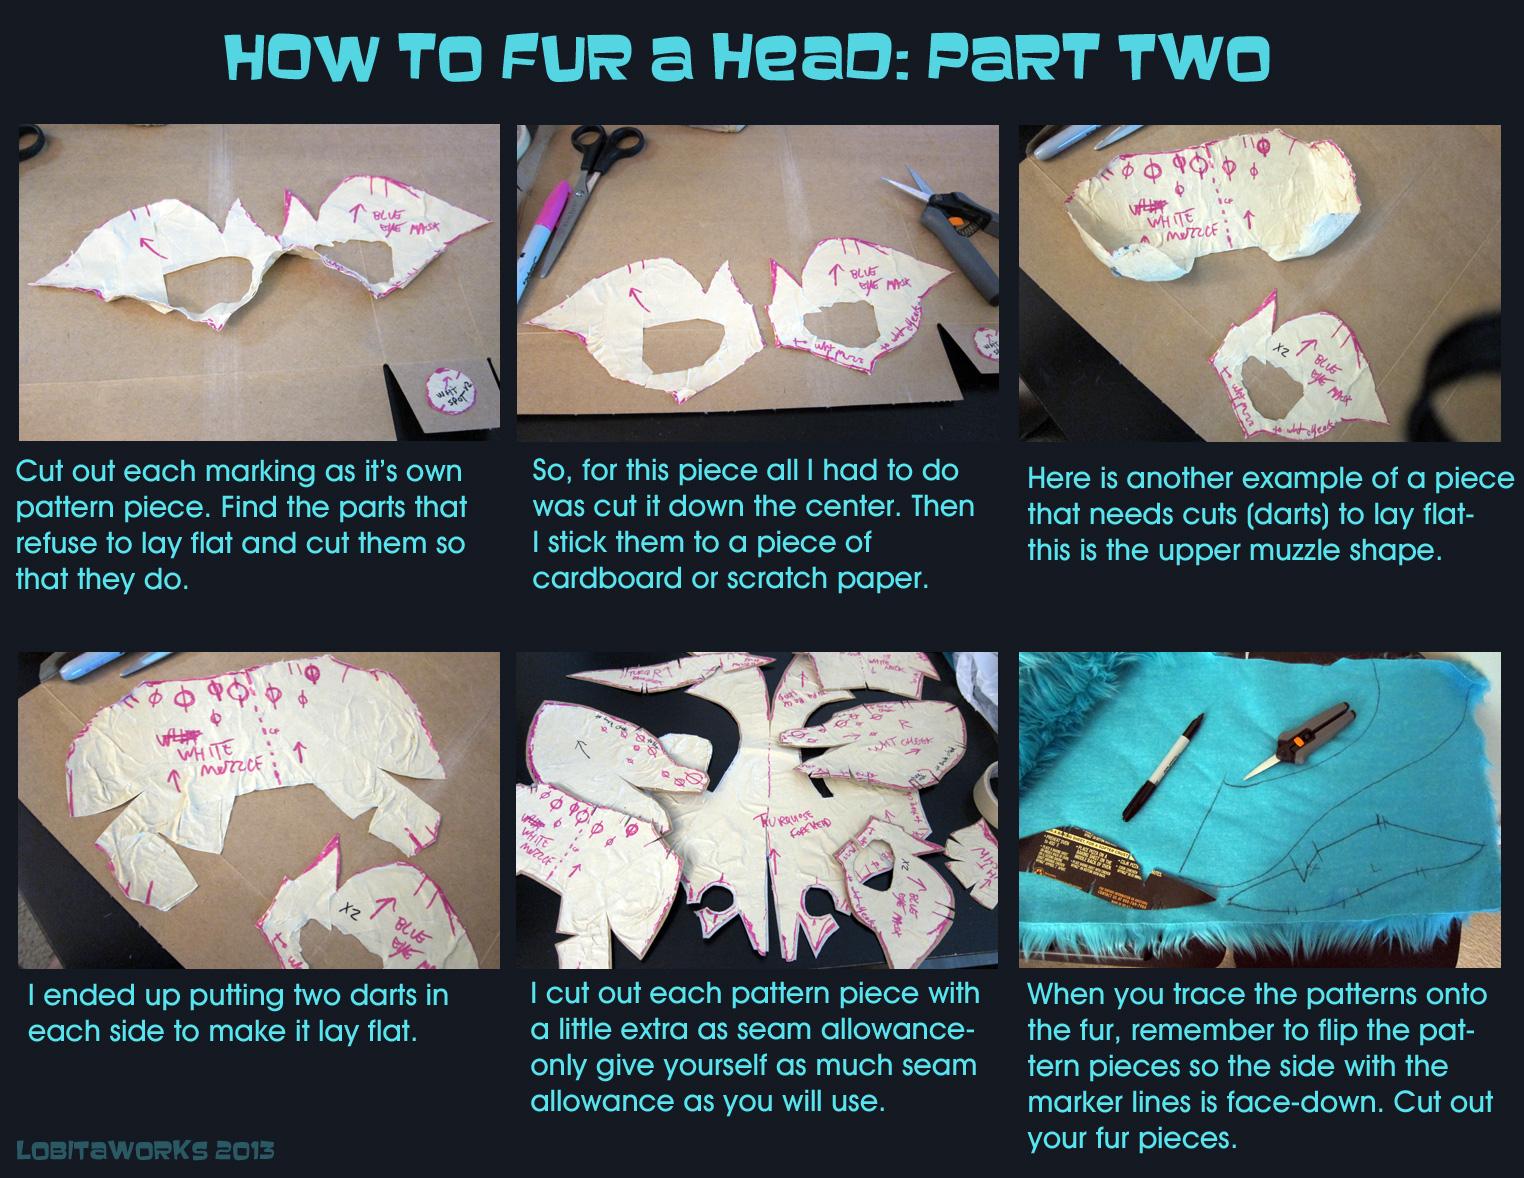 Lobitaworks 484 23 How To Fur A Head Pt 2 By Lobitaworks